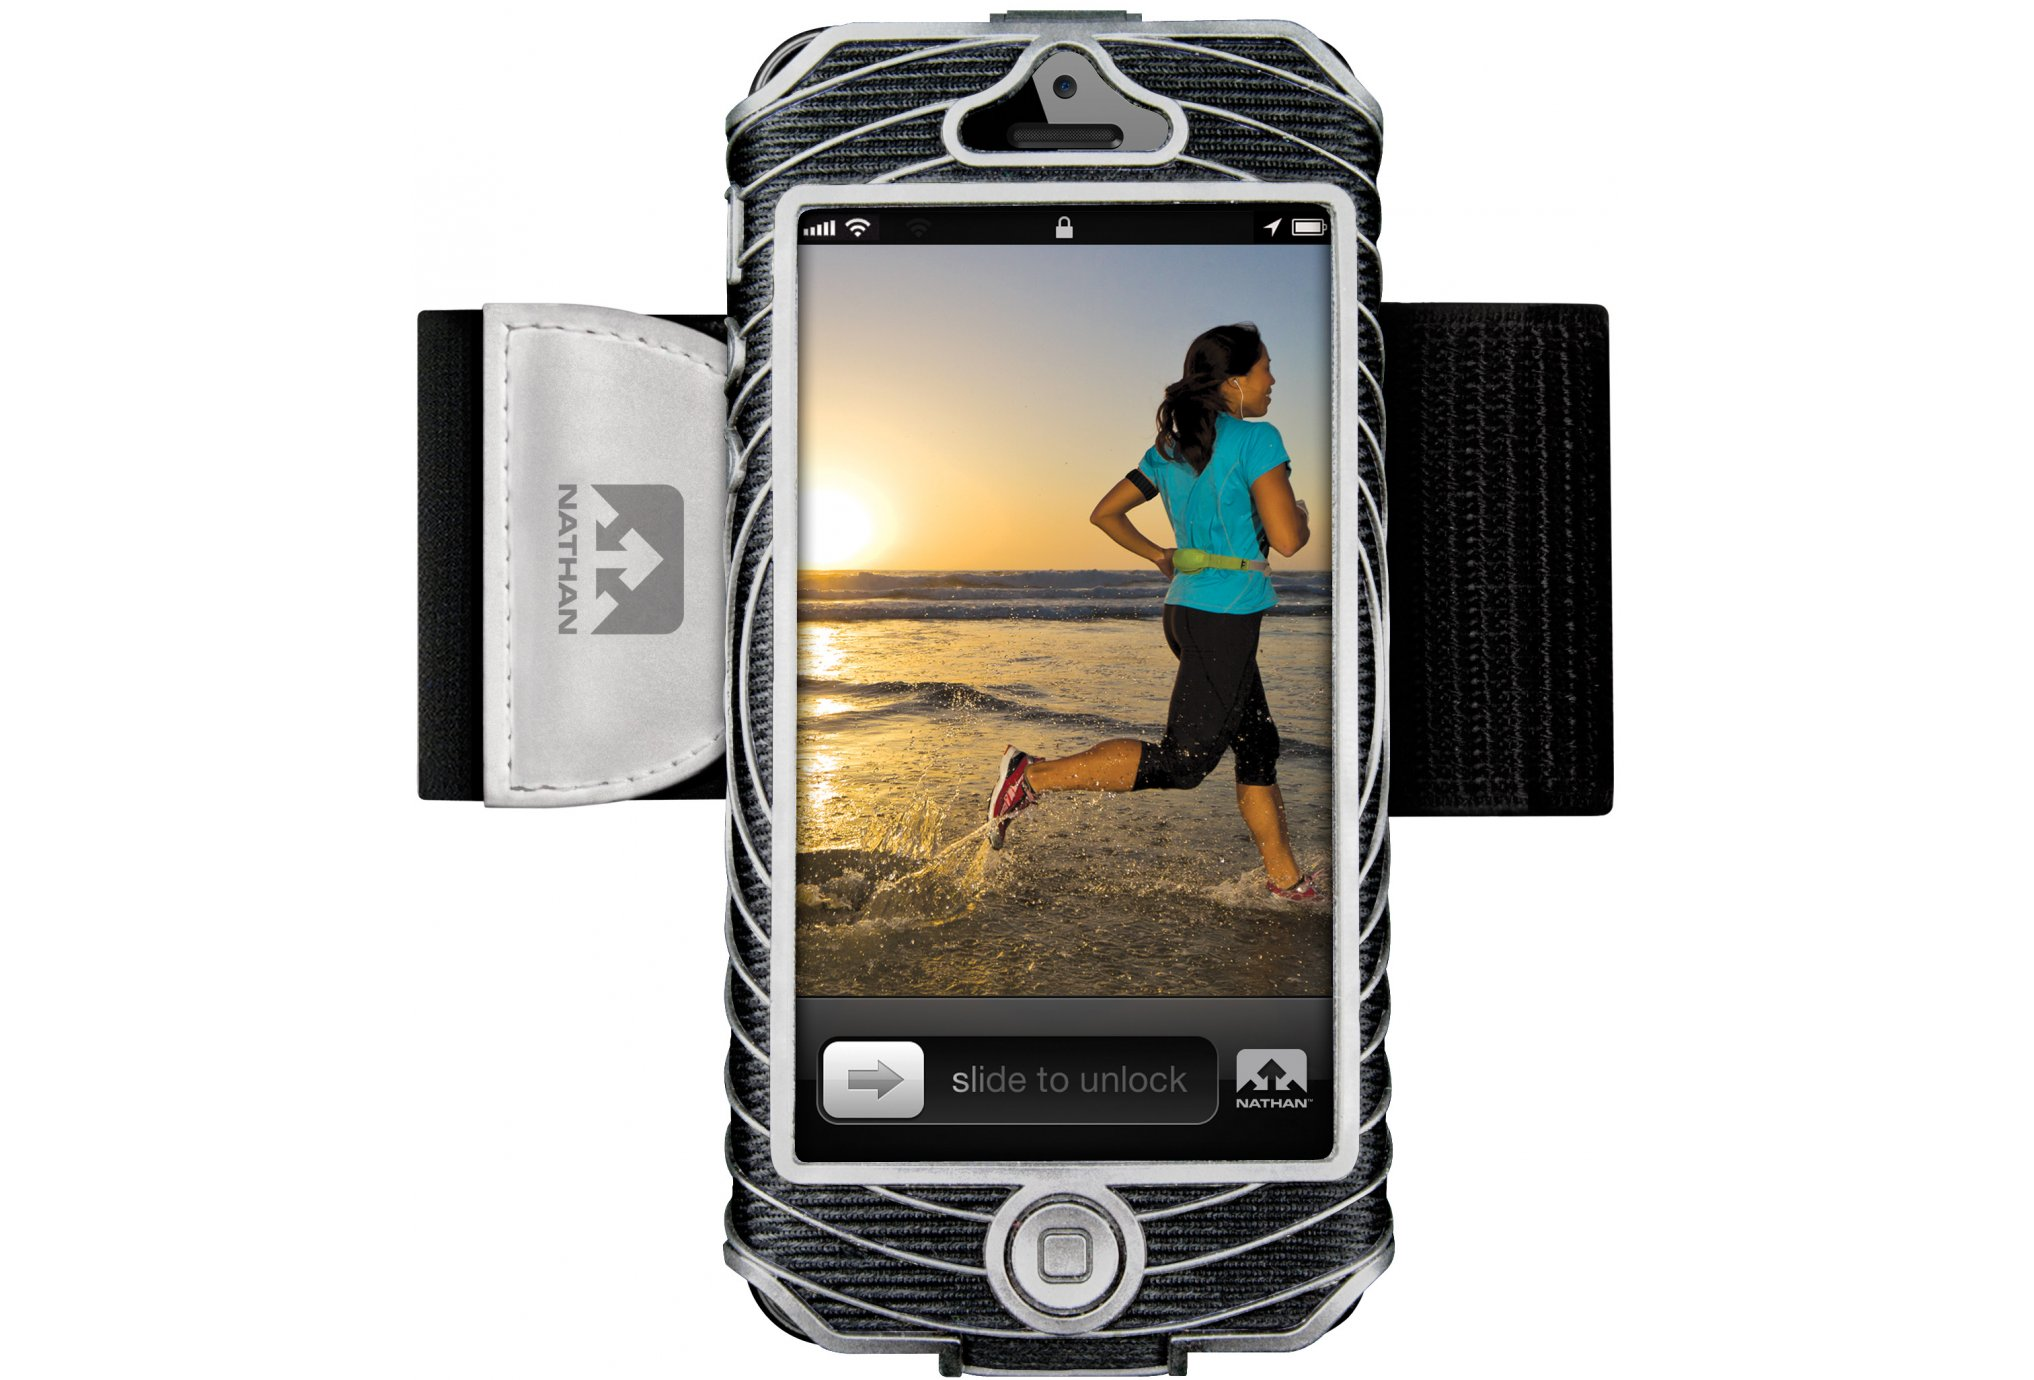 Nathan Sonic Boom Iphone 5 Accessoires téléphone